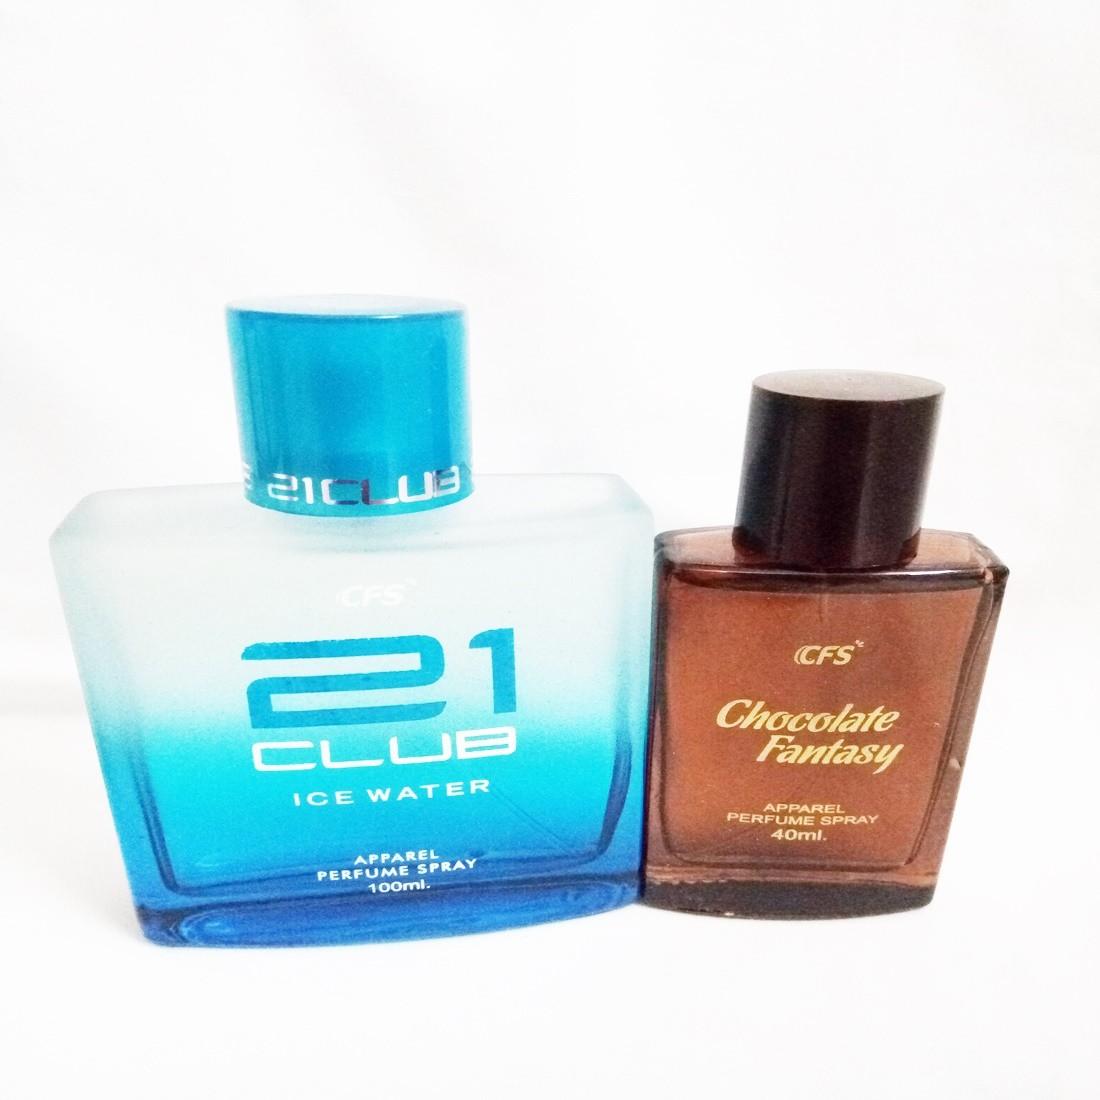 CFS Apparel Perfume Eau de Parfum  -  140 ml(For Men & Women)